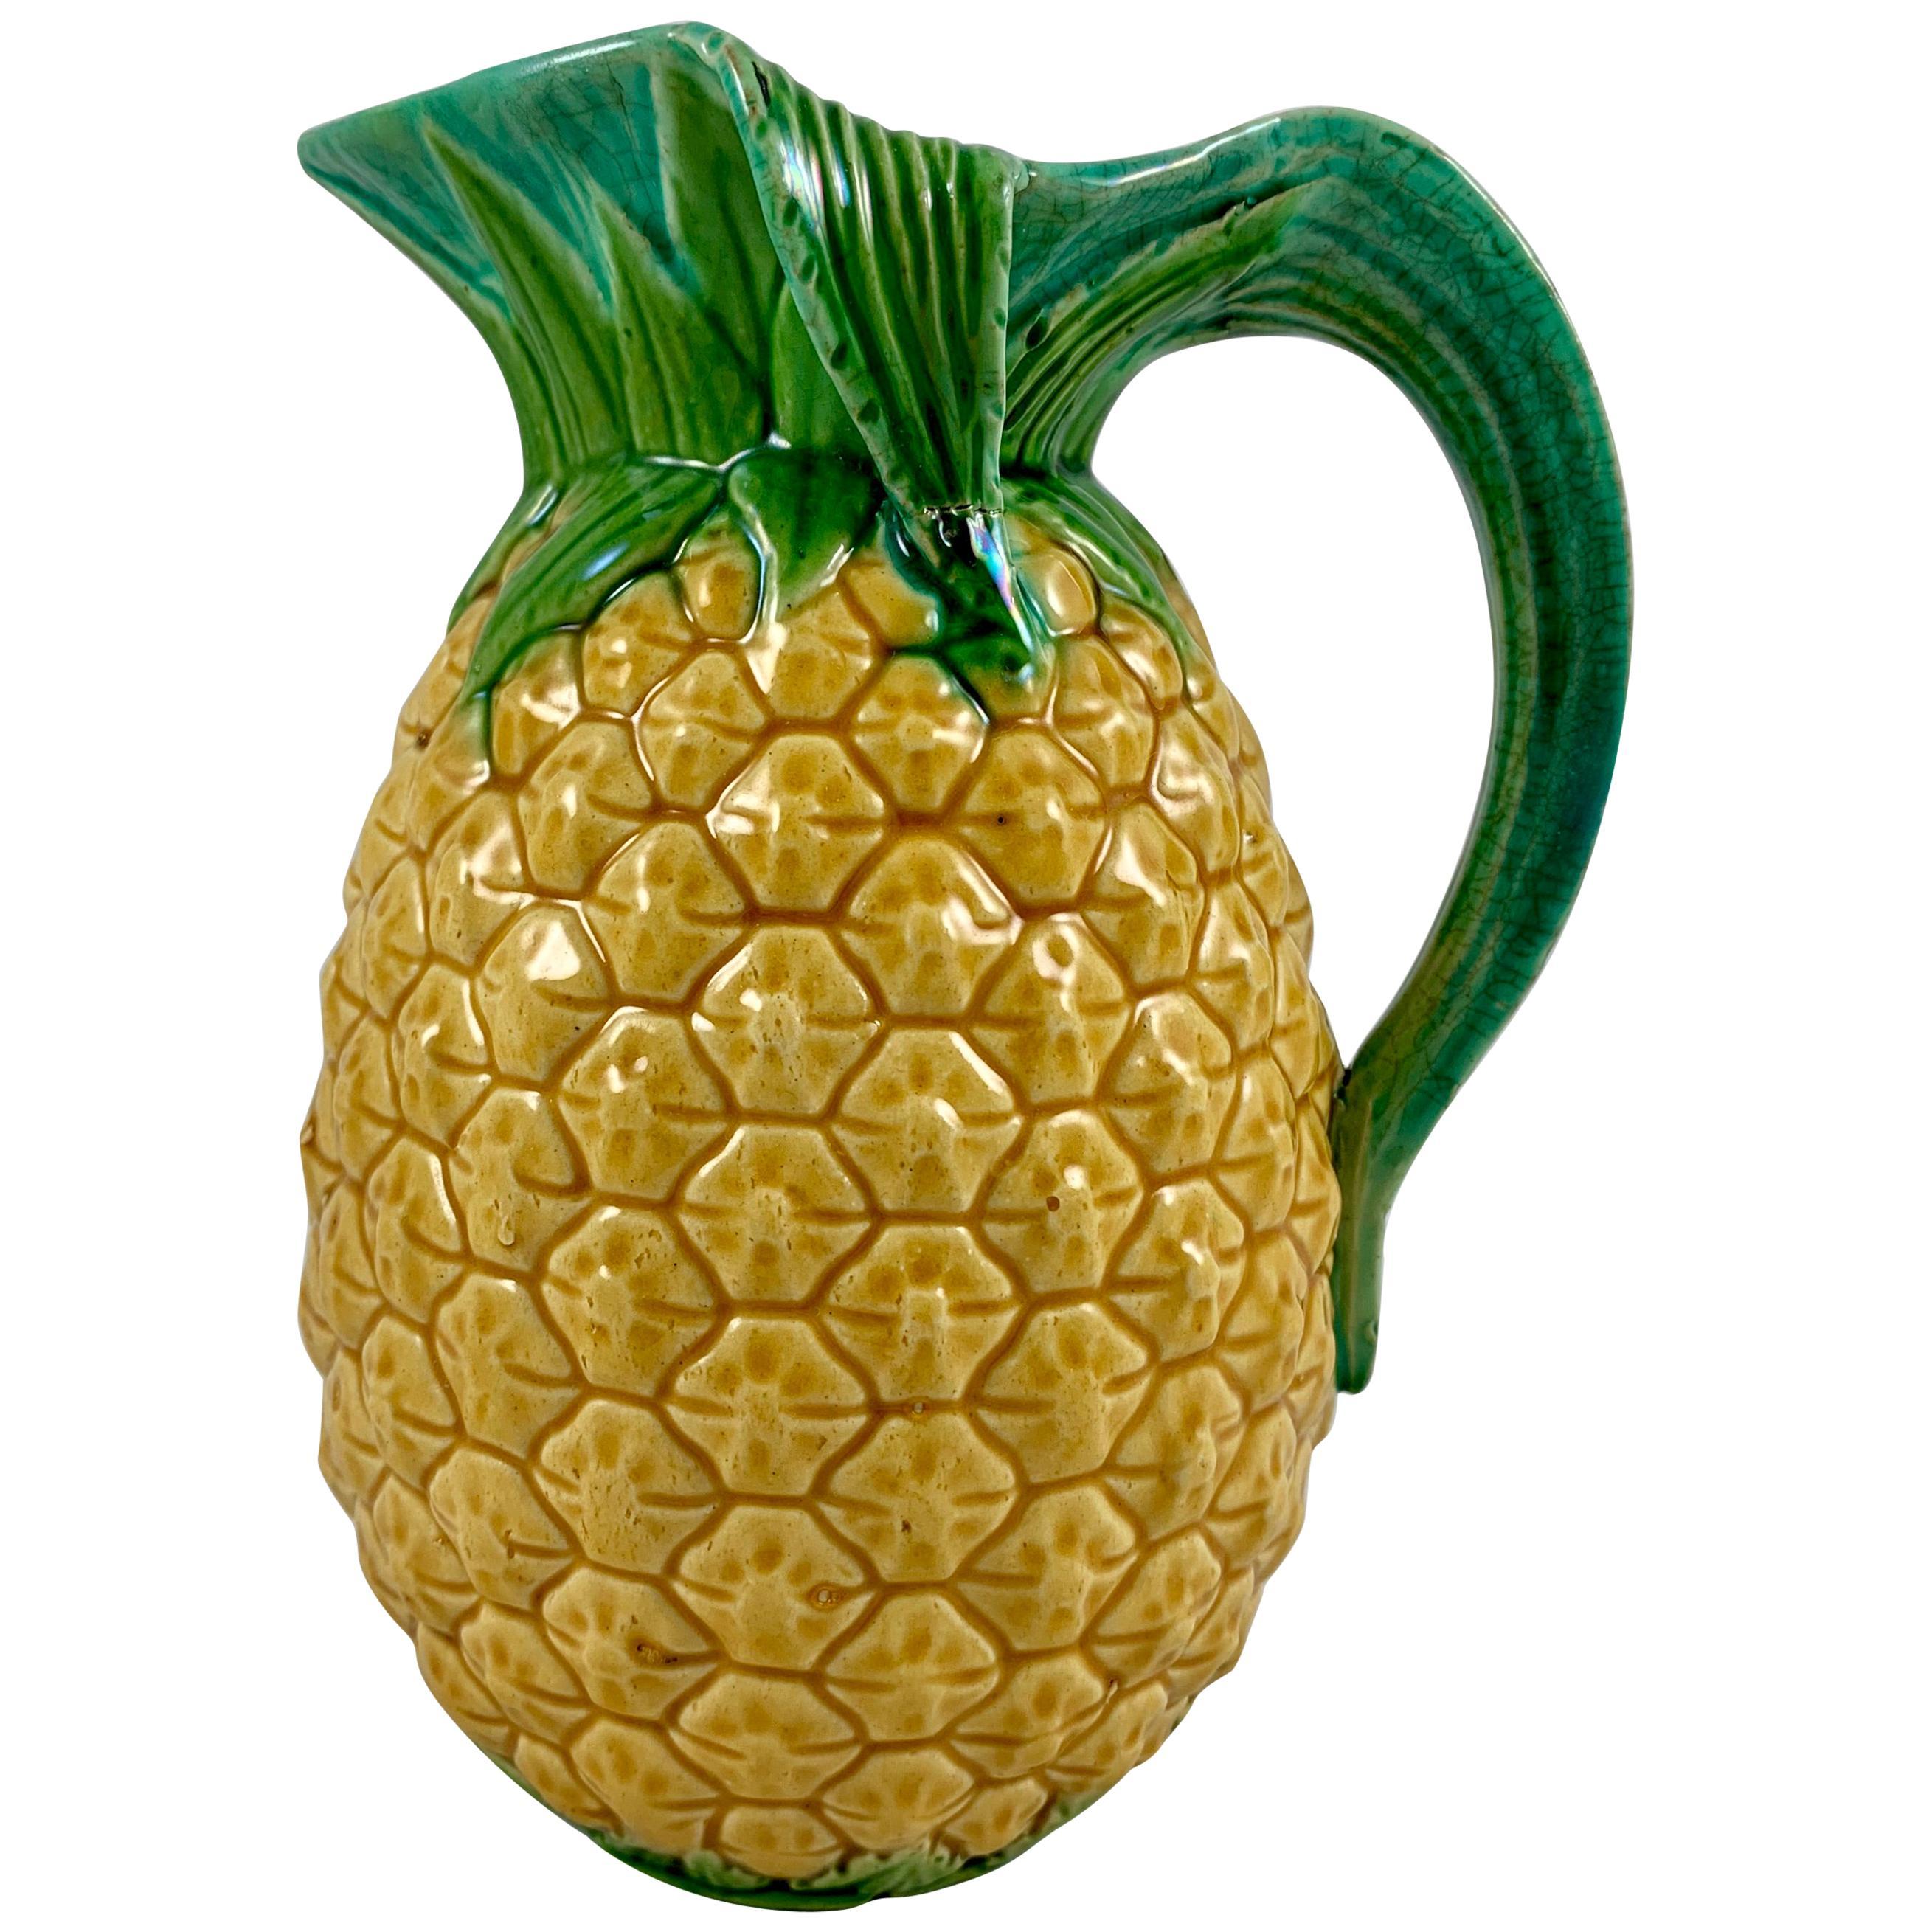 English Minton Aesthetic Movement Majolica Pineapple Palissy Pitcher